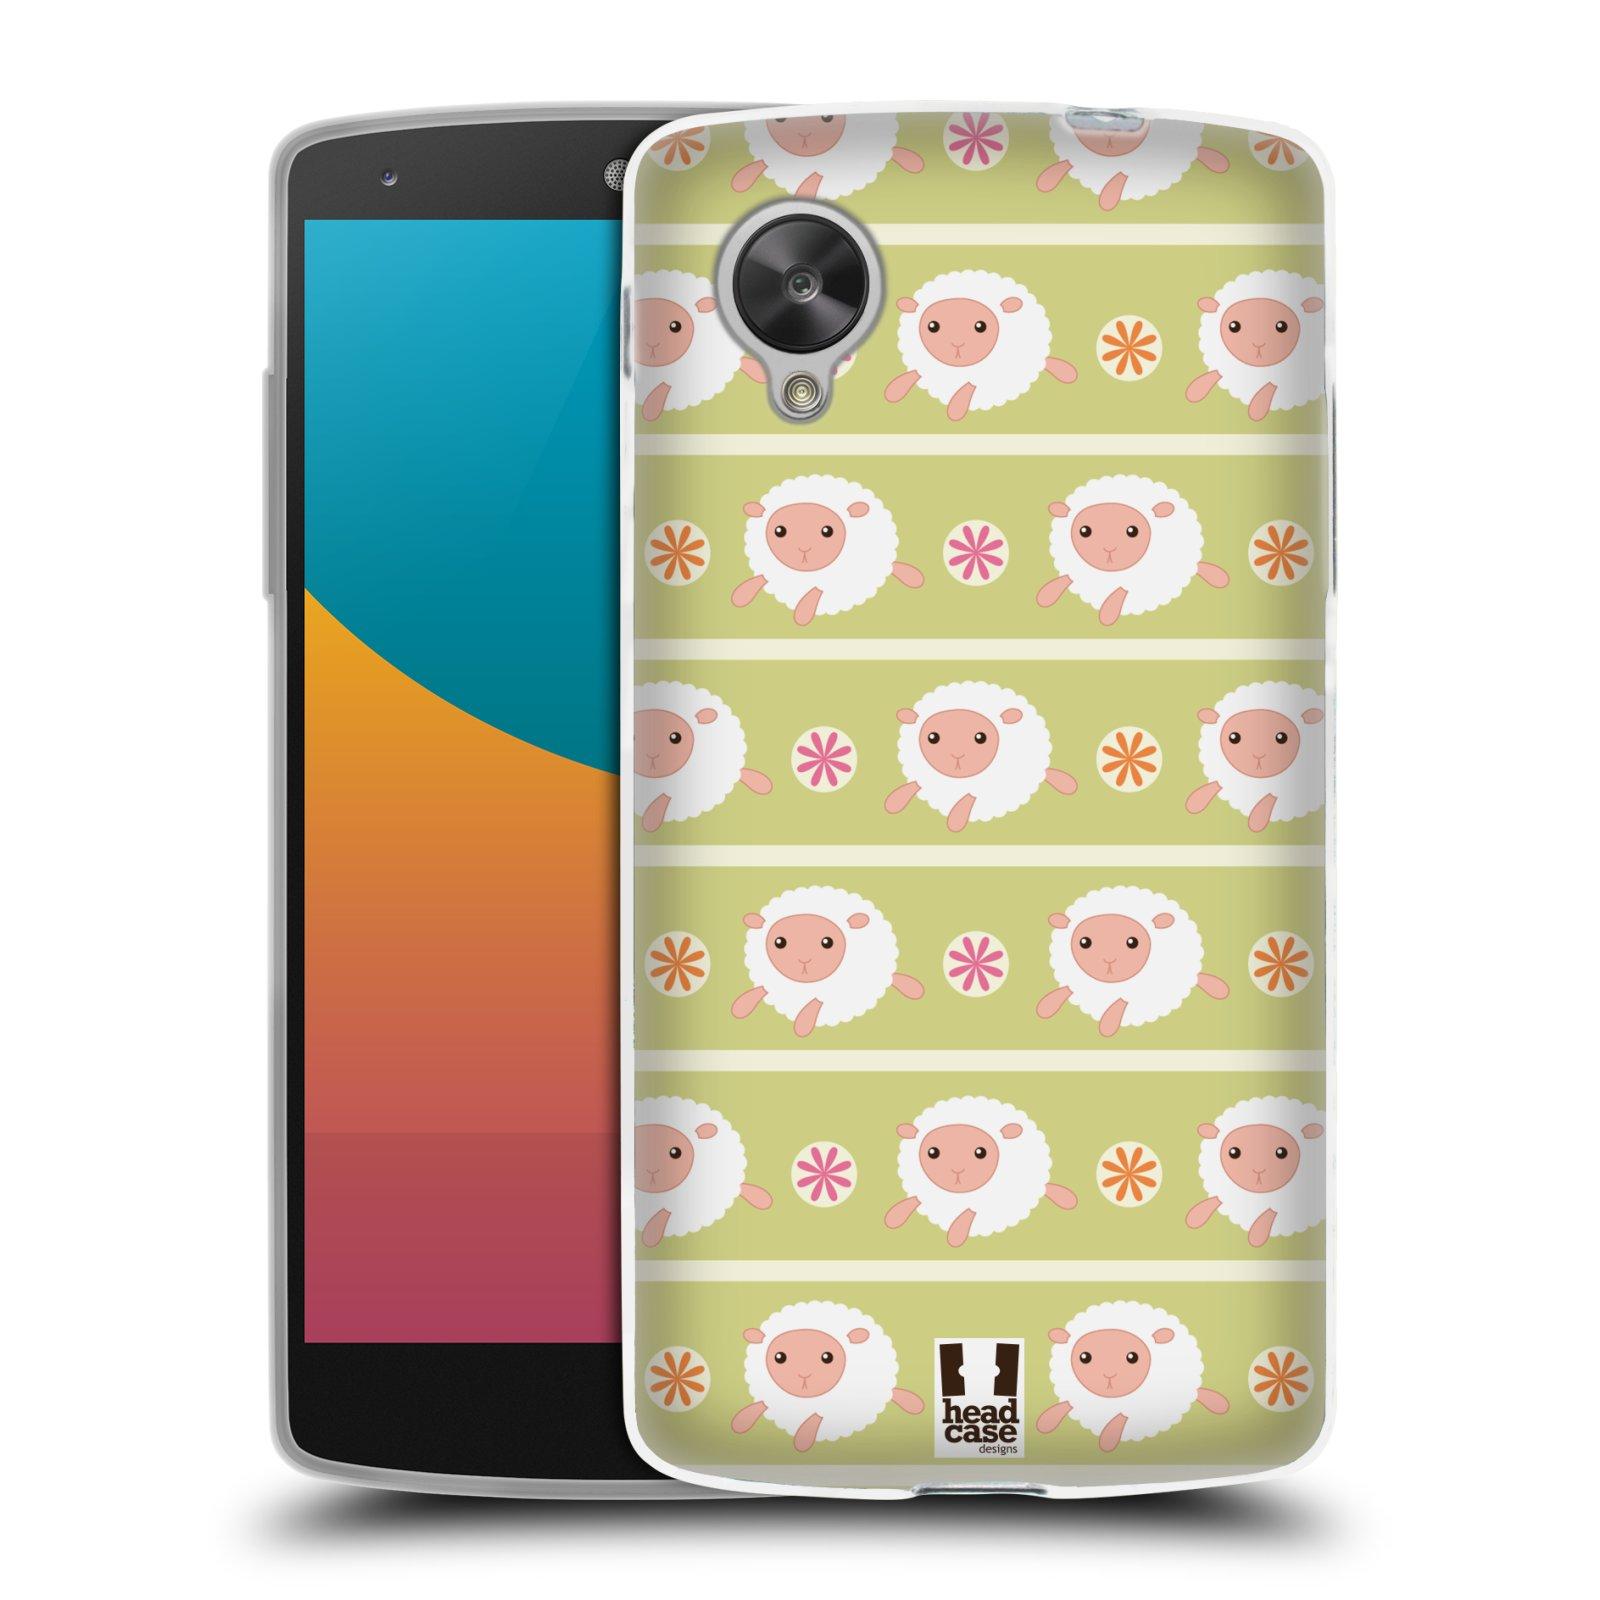 HEAD CASE silikonový obal na mobil LG NEXUS 5 (D821) vzor roztomilé zvířecí vzory ovečky